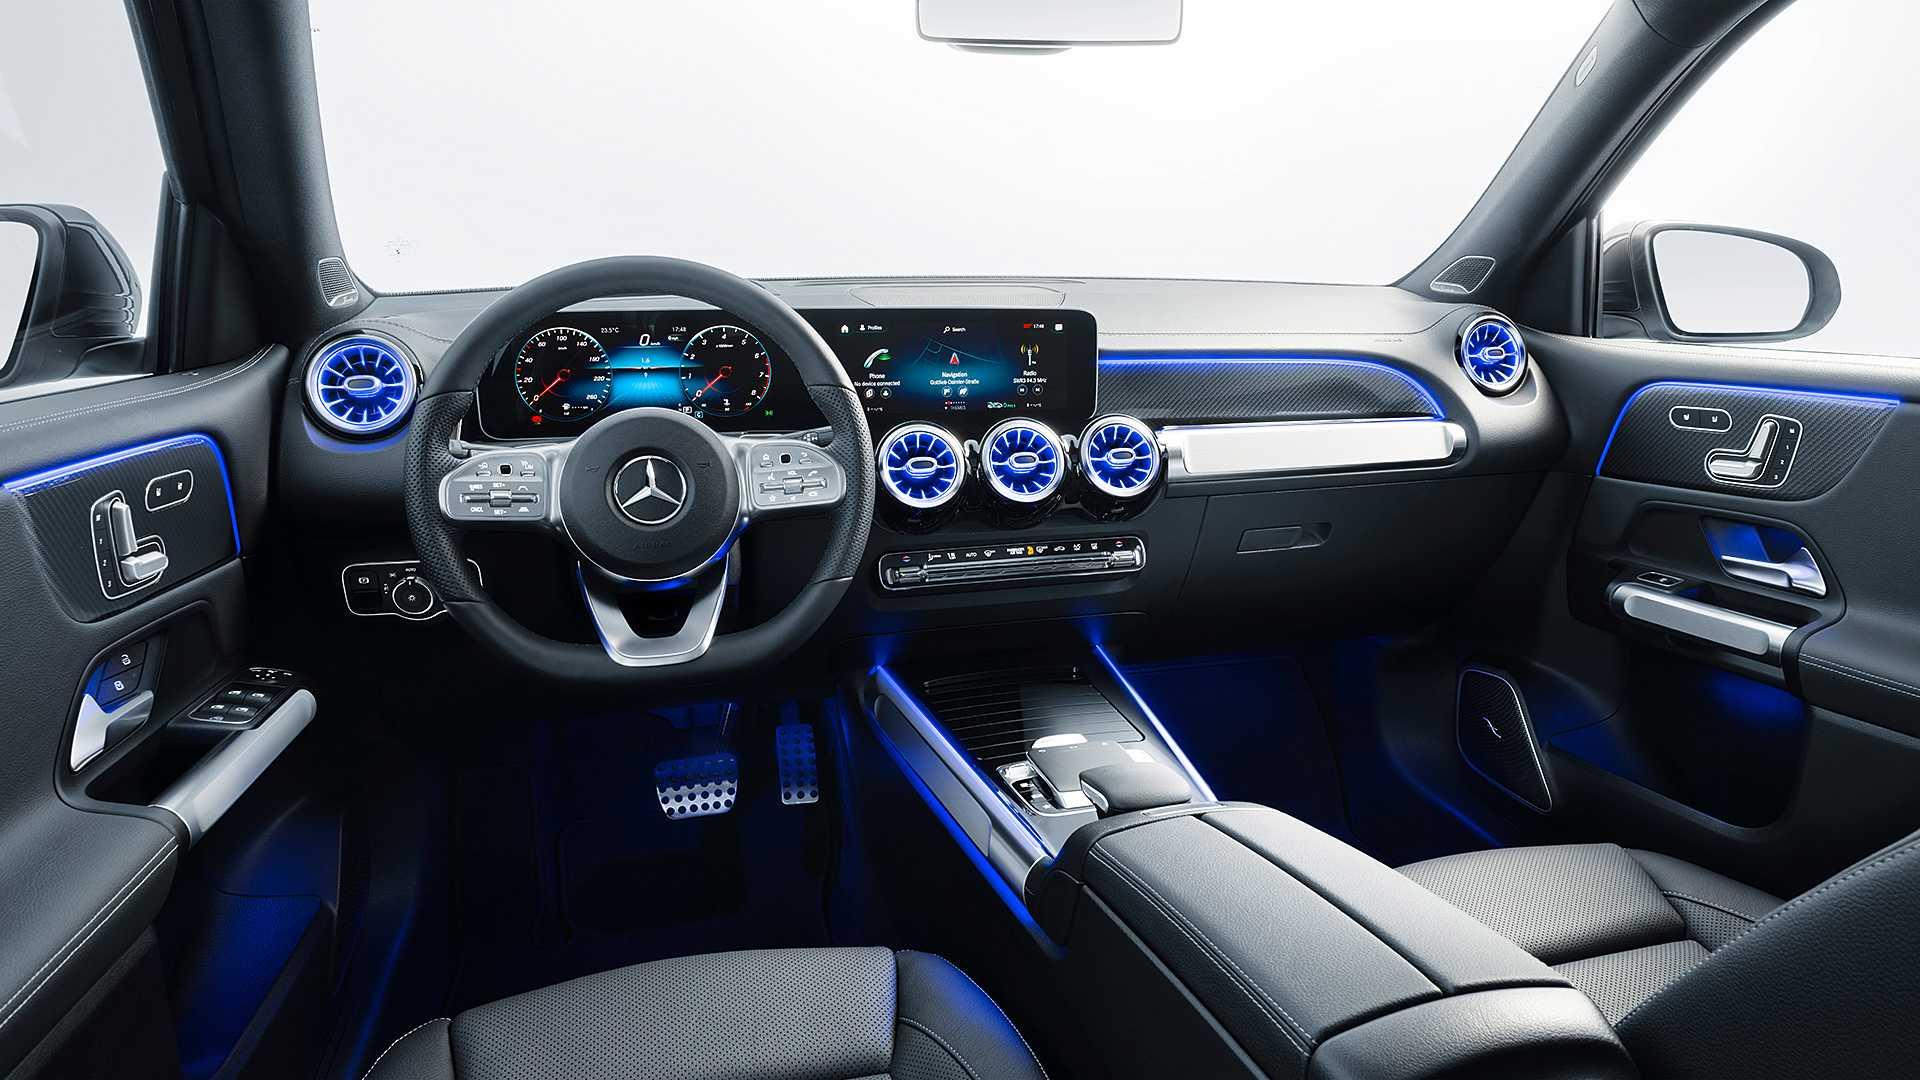 Mercedes-Benz GLB 2020: фото и обзор Гелендвагена в миниатюре